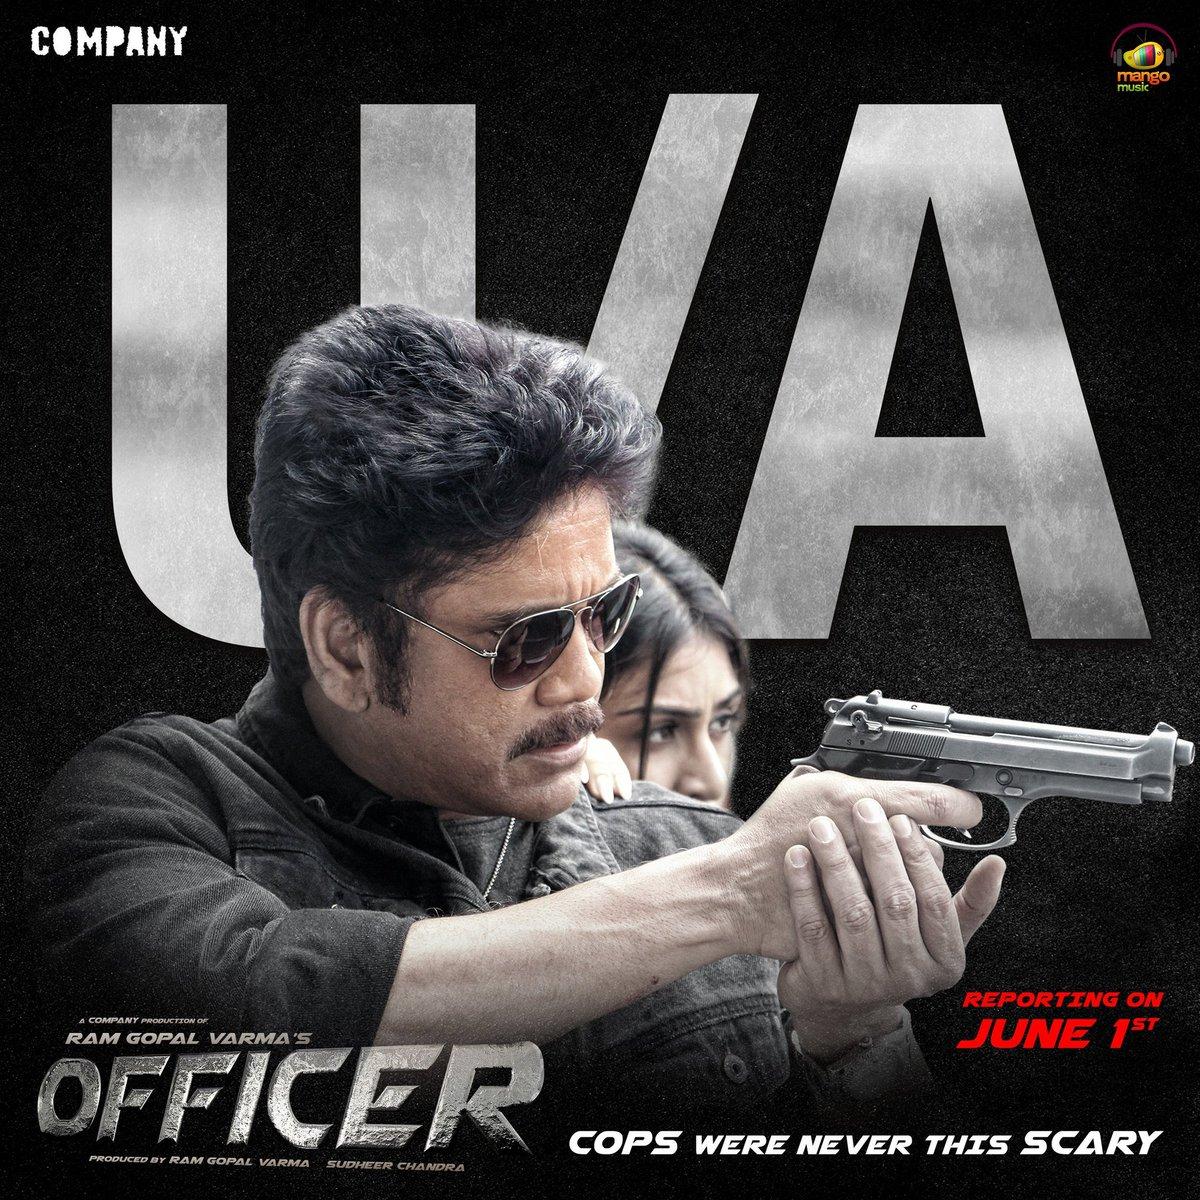 Officer Movie Censor Report